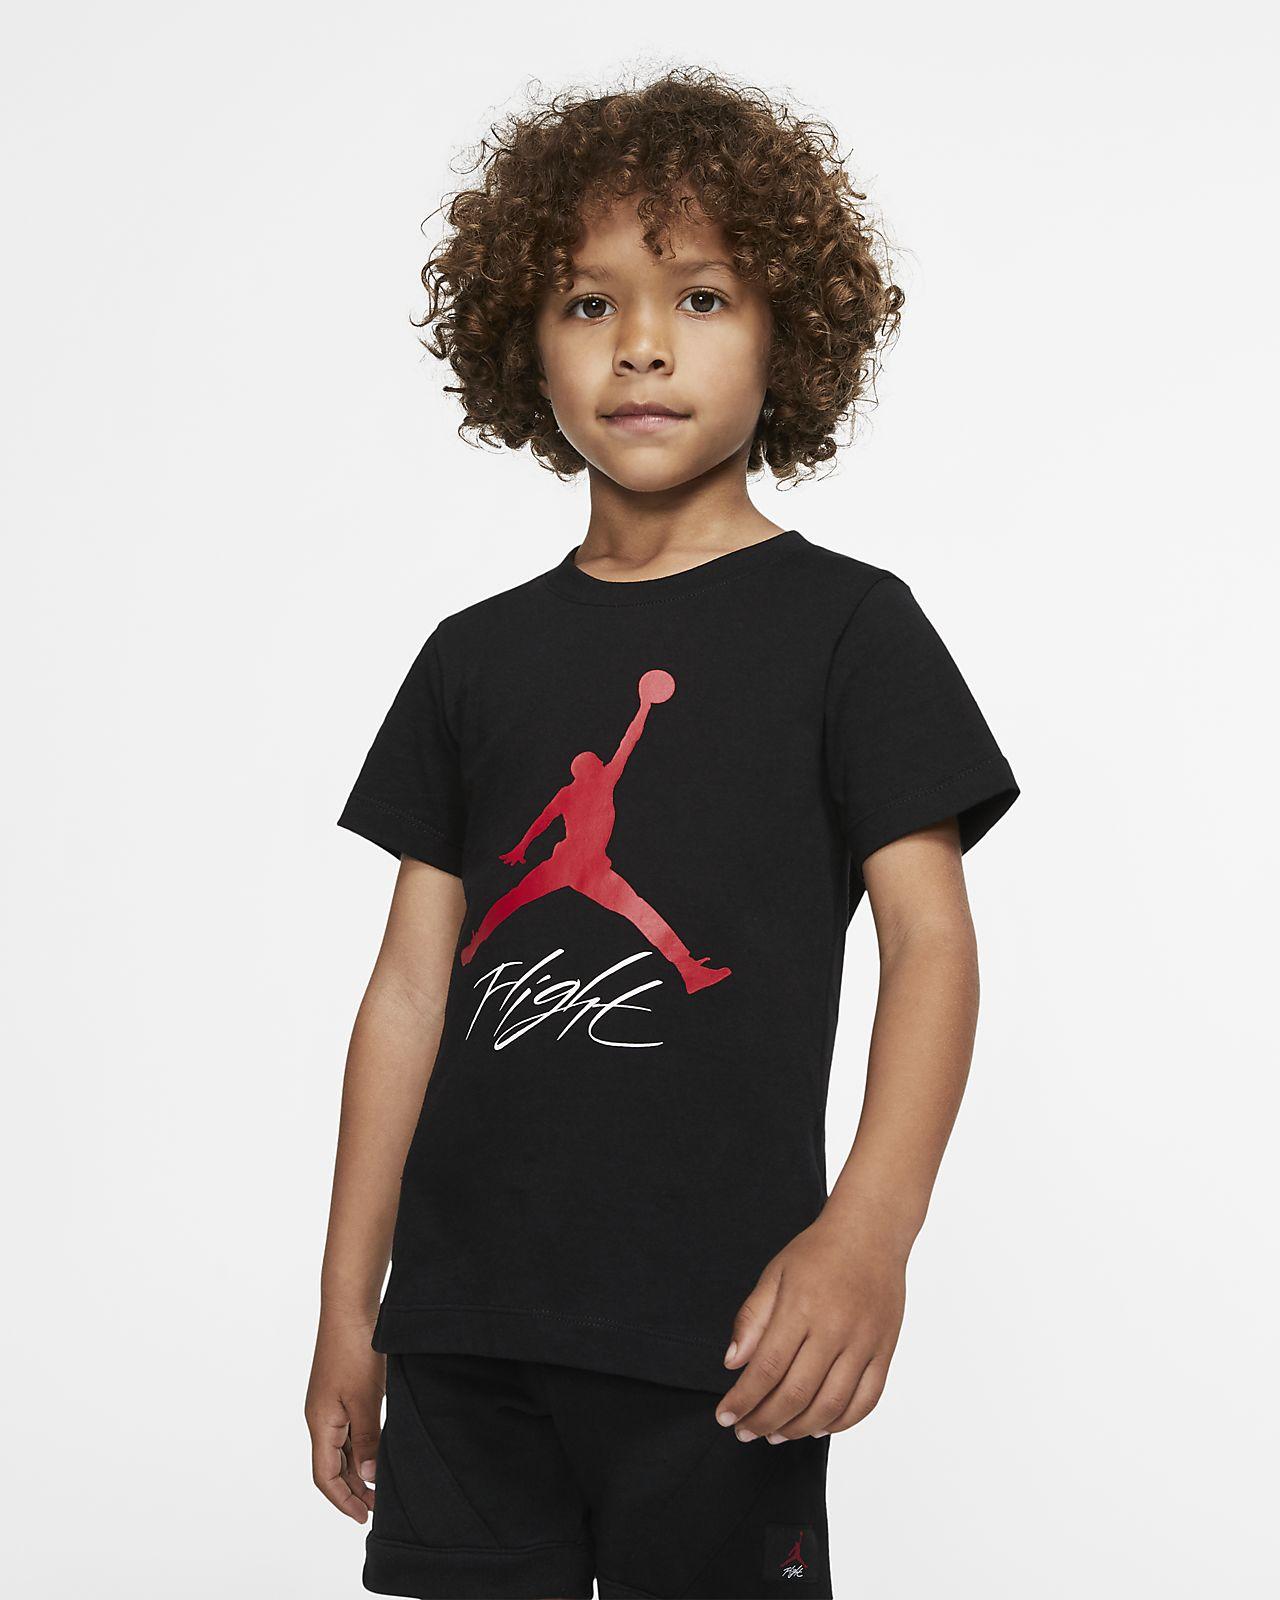 jordan t shirt kids